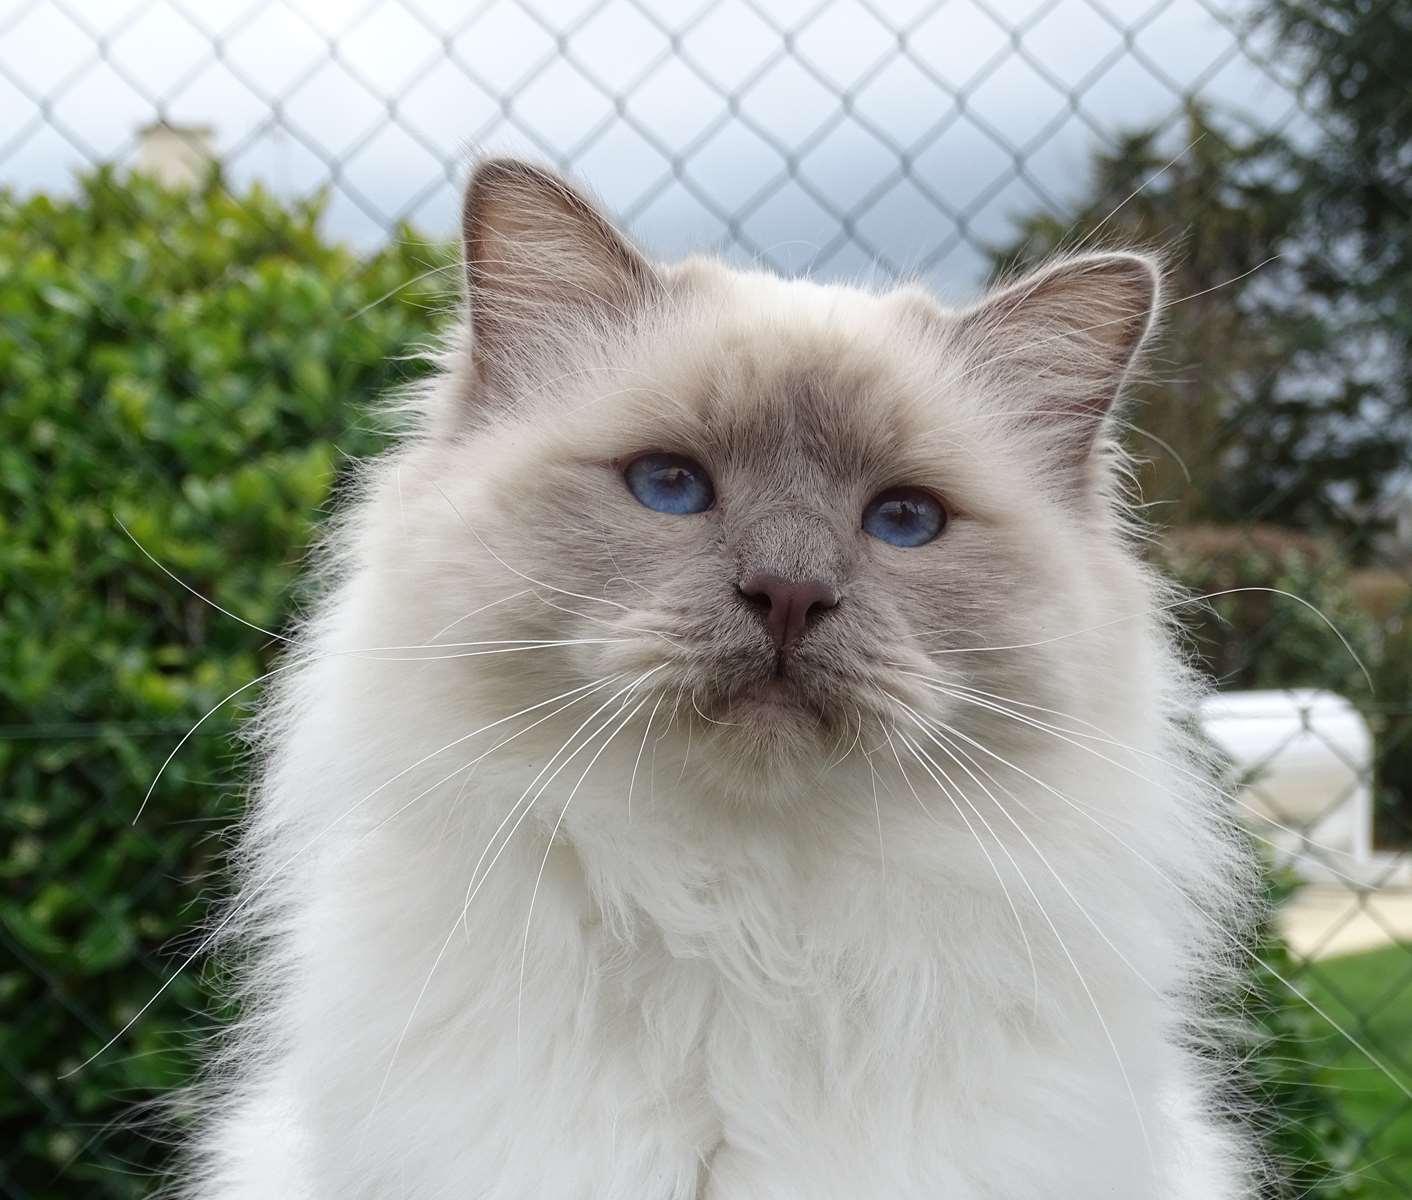 Au jardin des hesp rides birmans kittens for Au jardin des hesperides